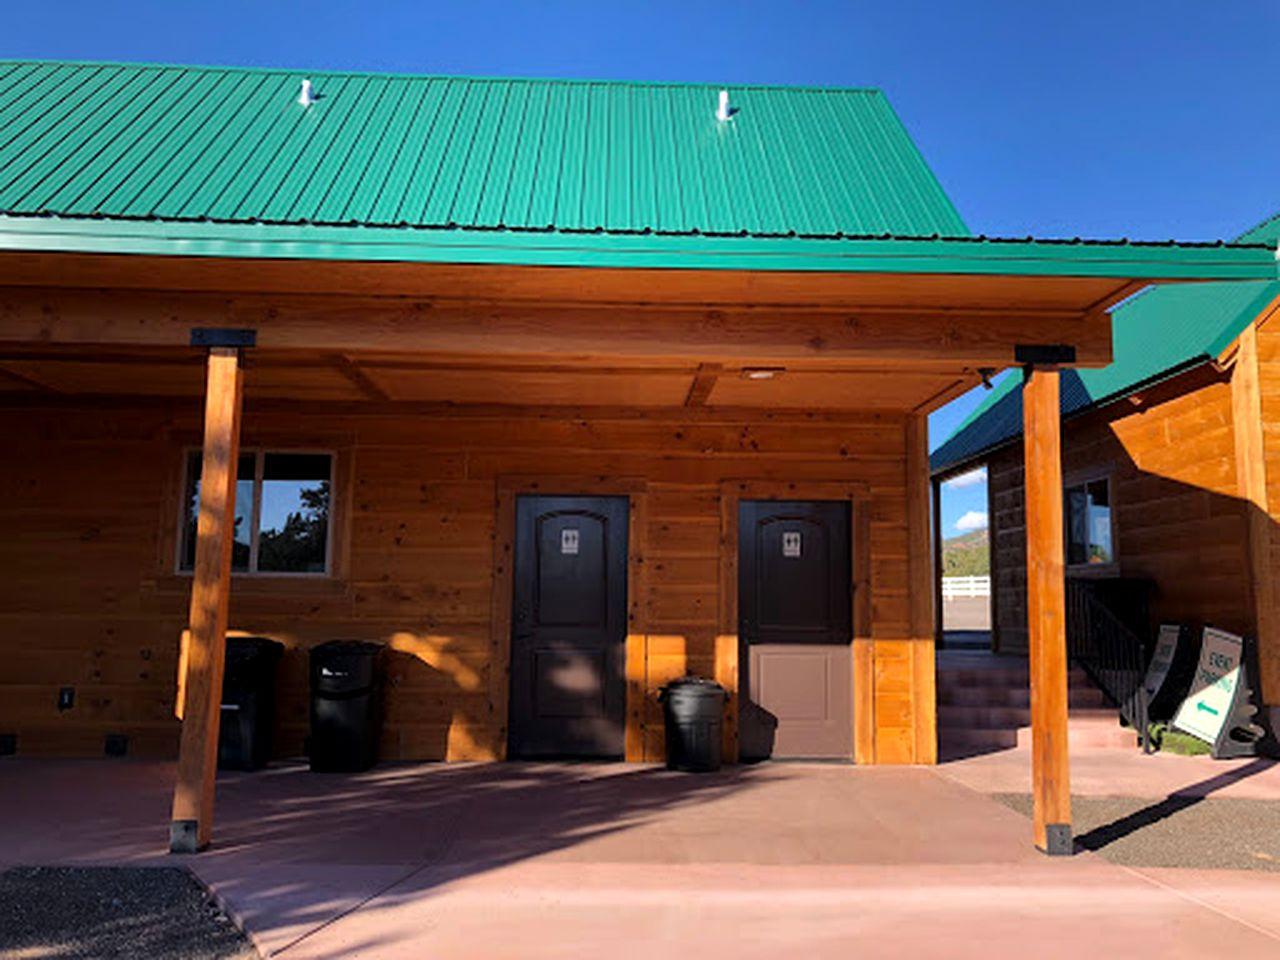 Lakeside Cabin near Pine Valley, Utah